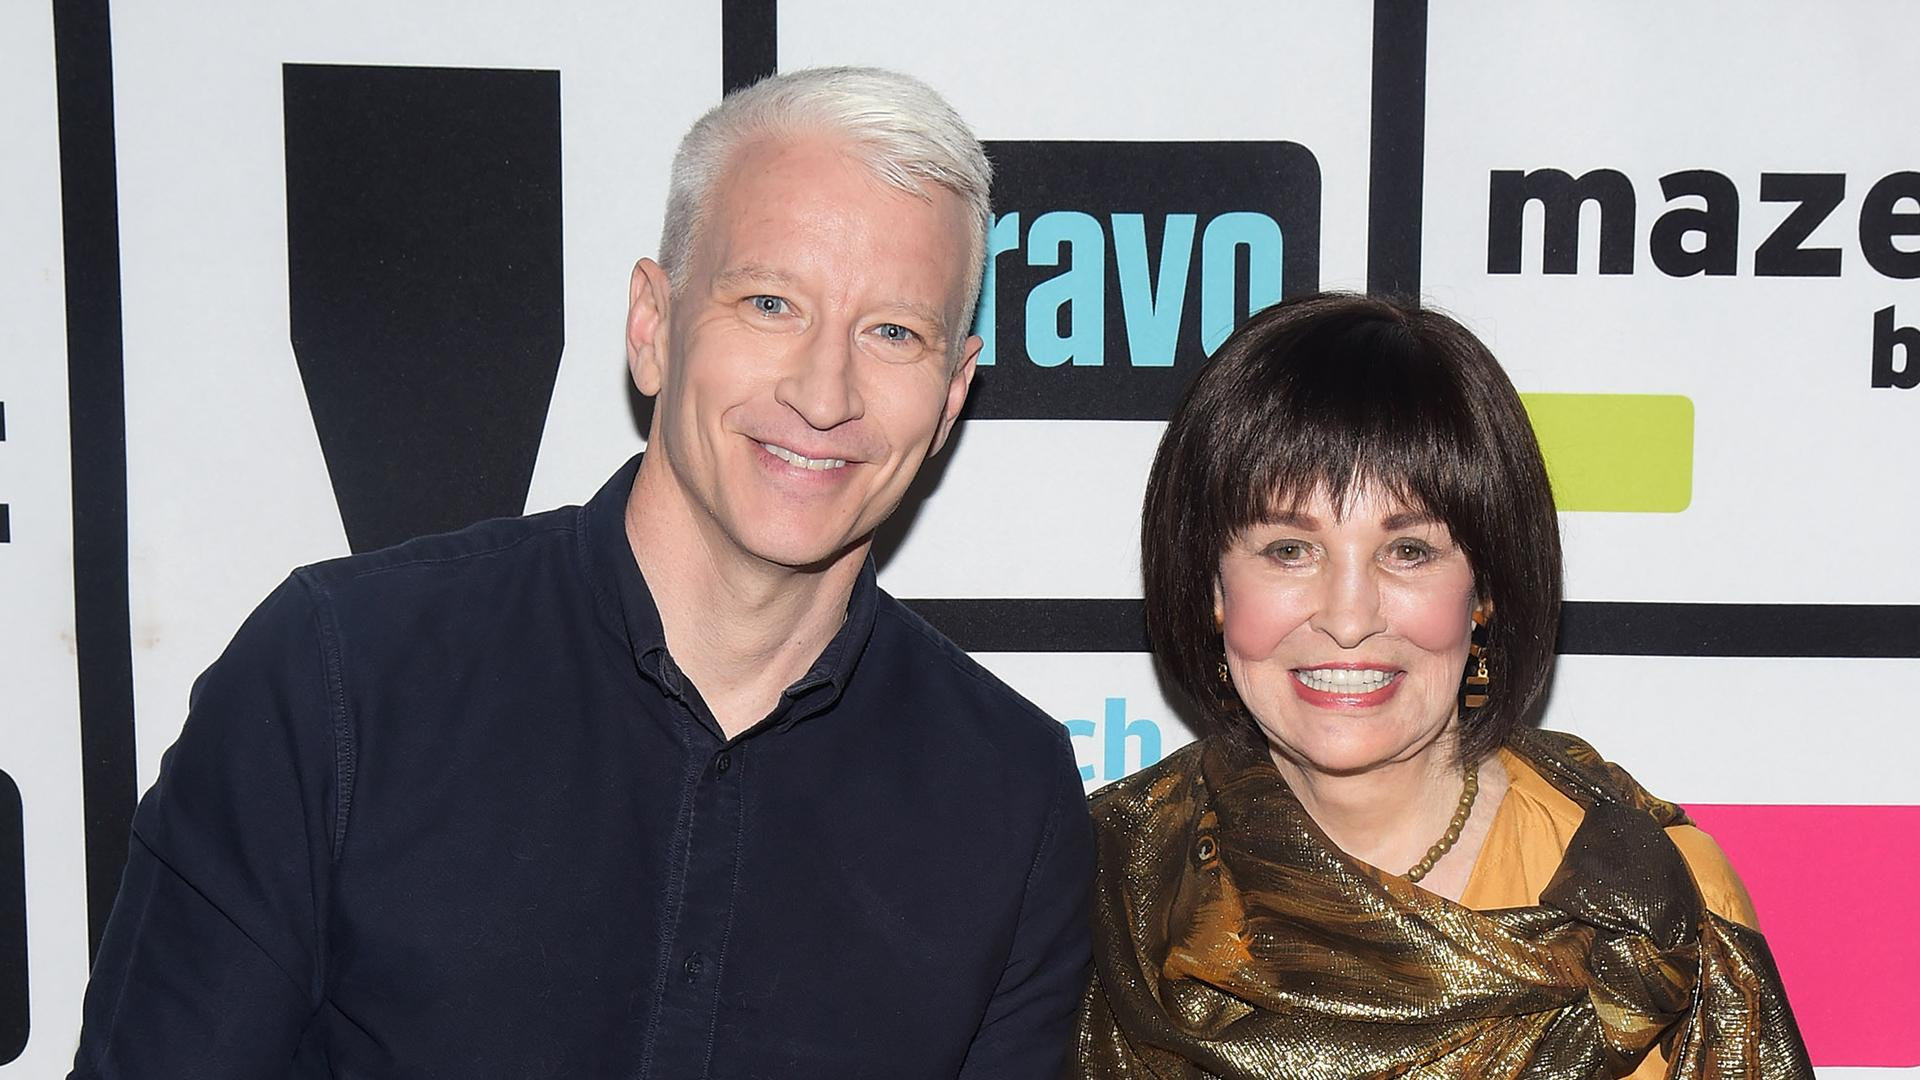 Anderson Cooper Posts Touching Tribute to Mom Gloria Vanderbilt on Instagram